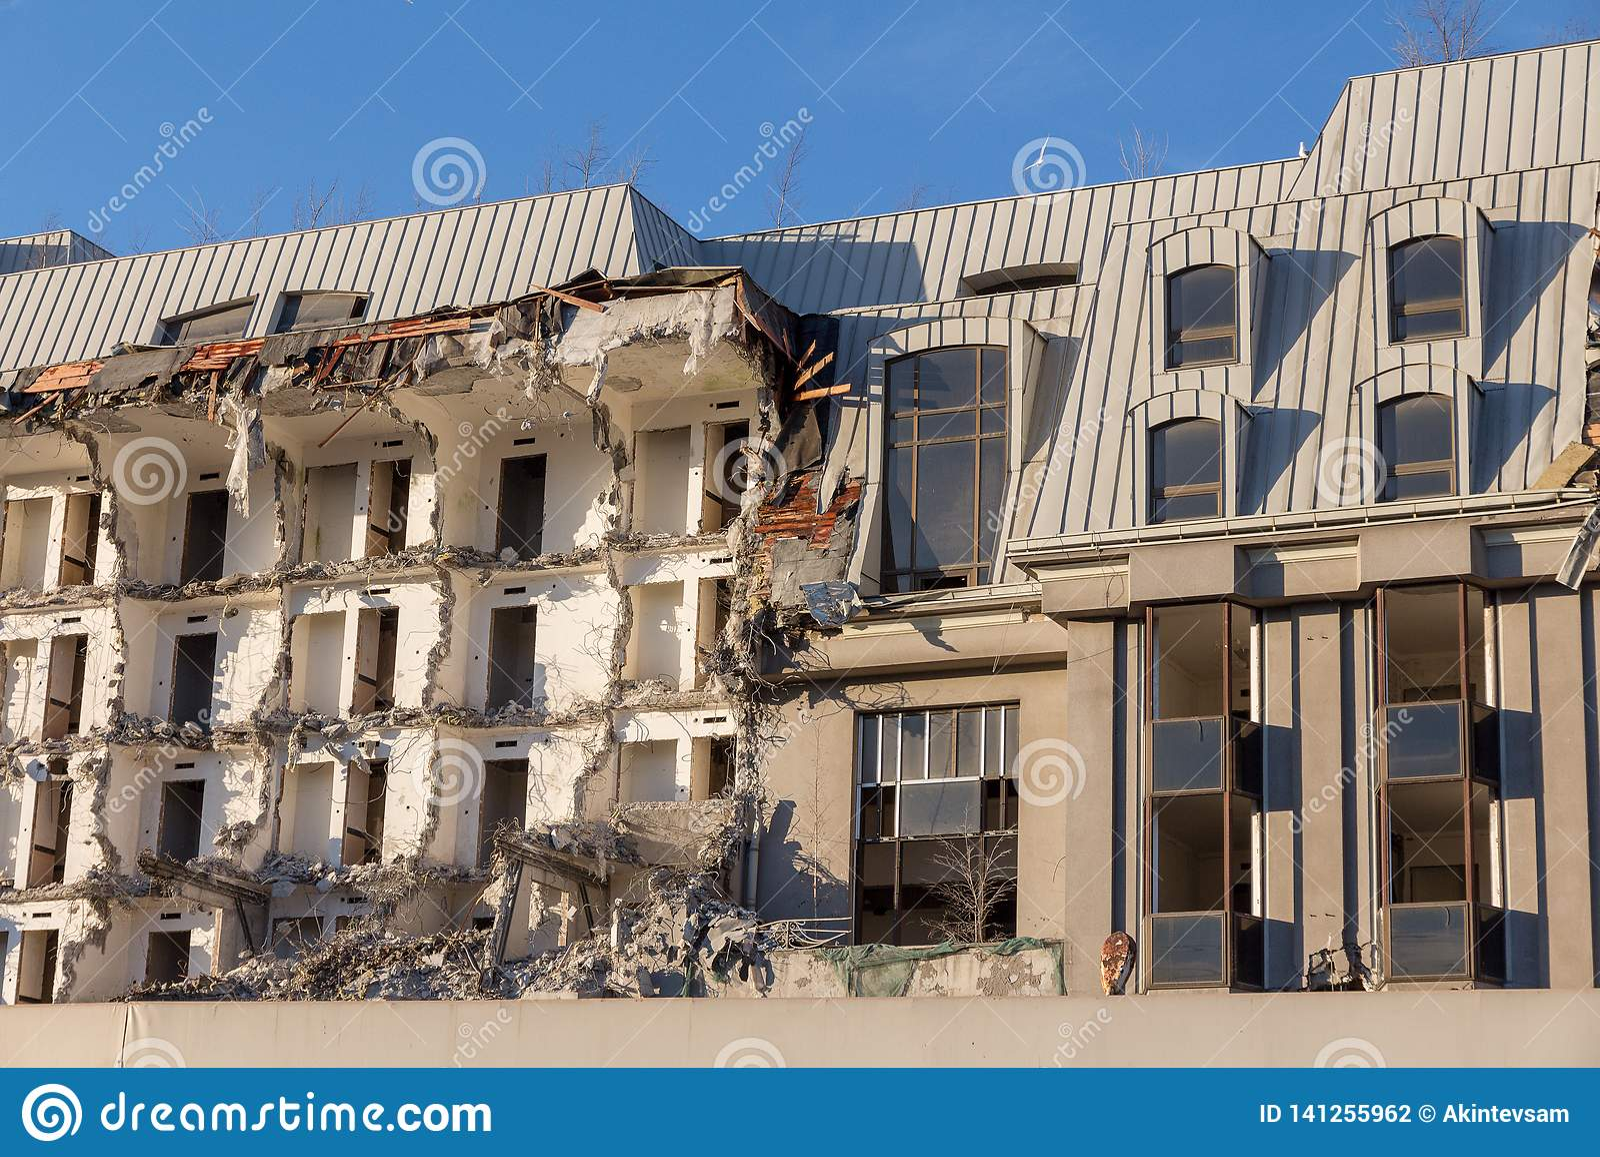 Demolition of a building. destruction in a residential urban quarter